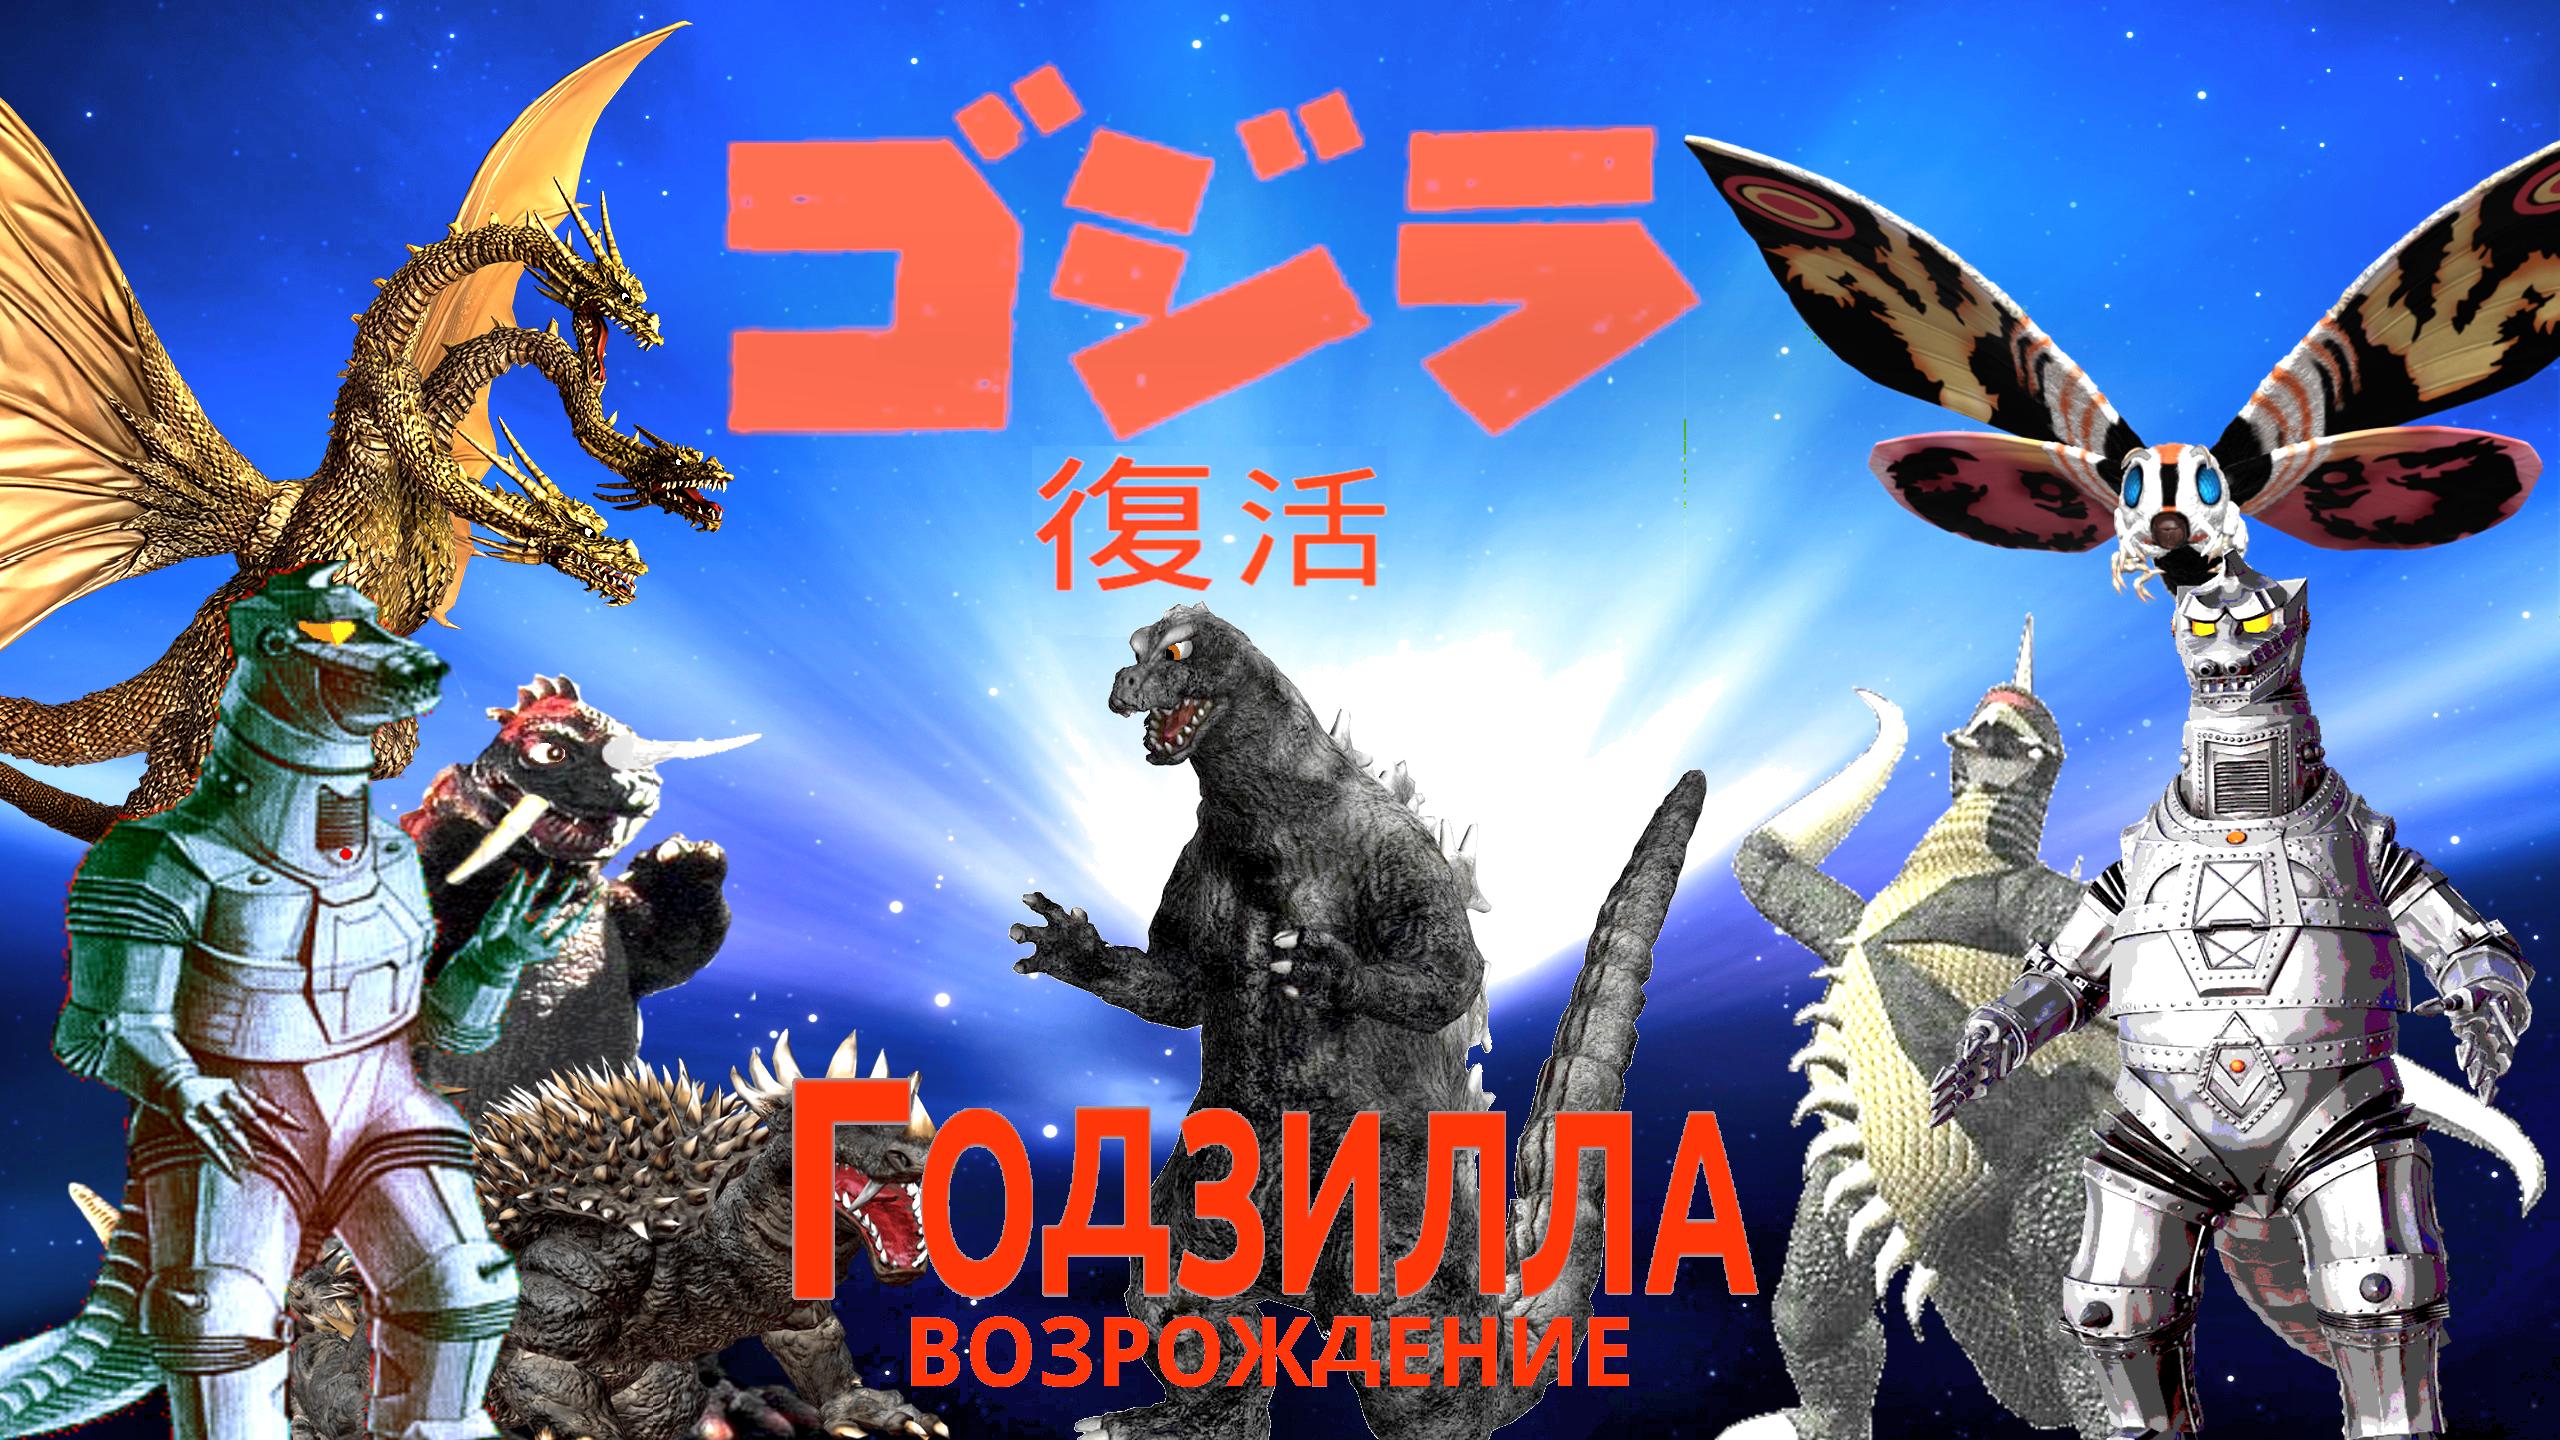 http://s8.uplds.ru/Sdszj.png